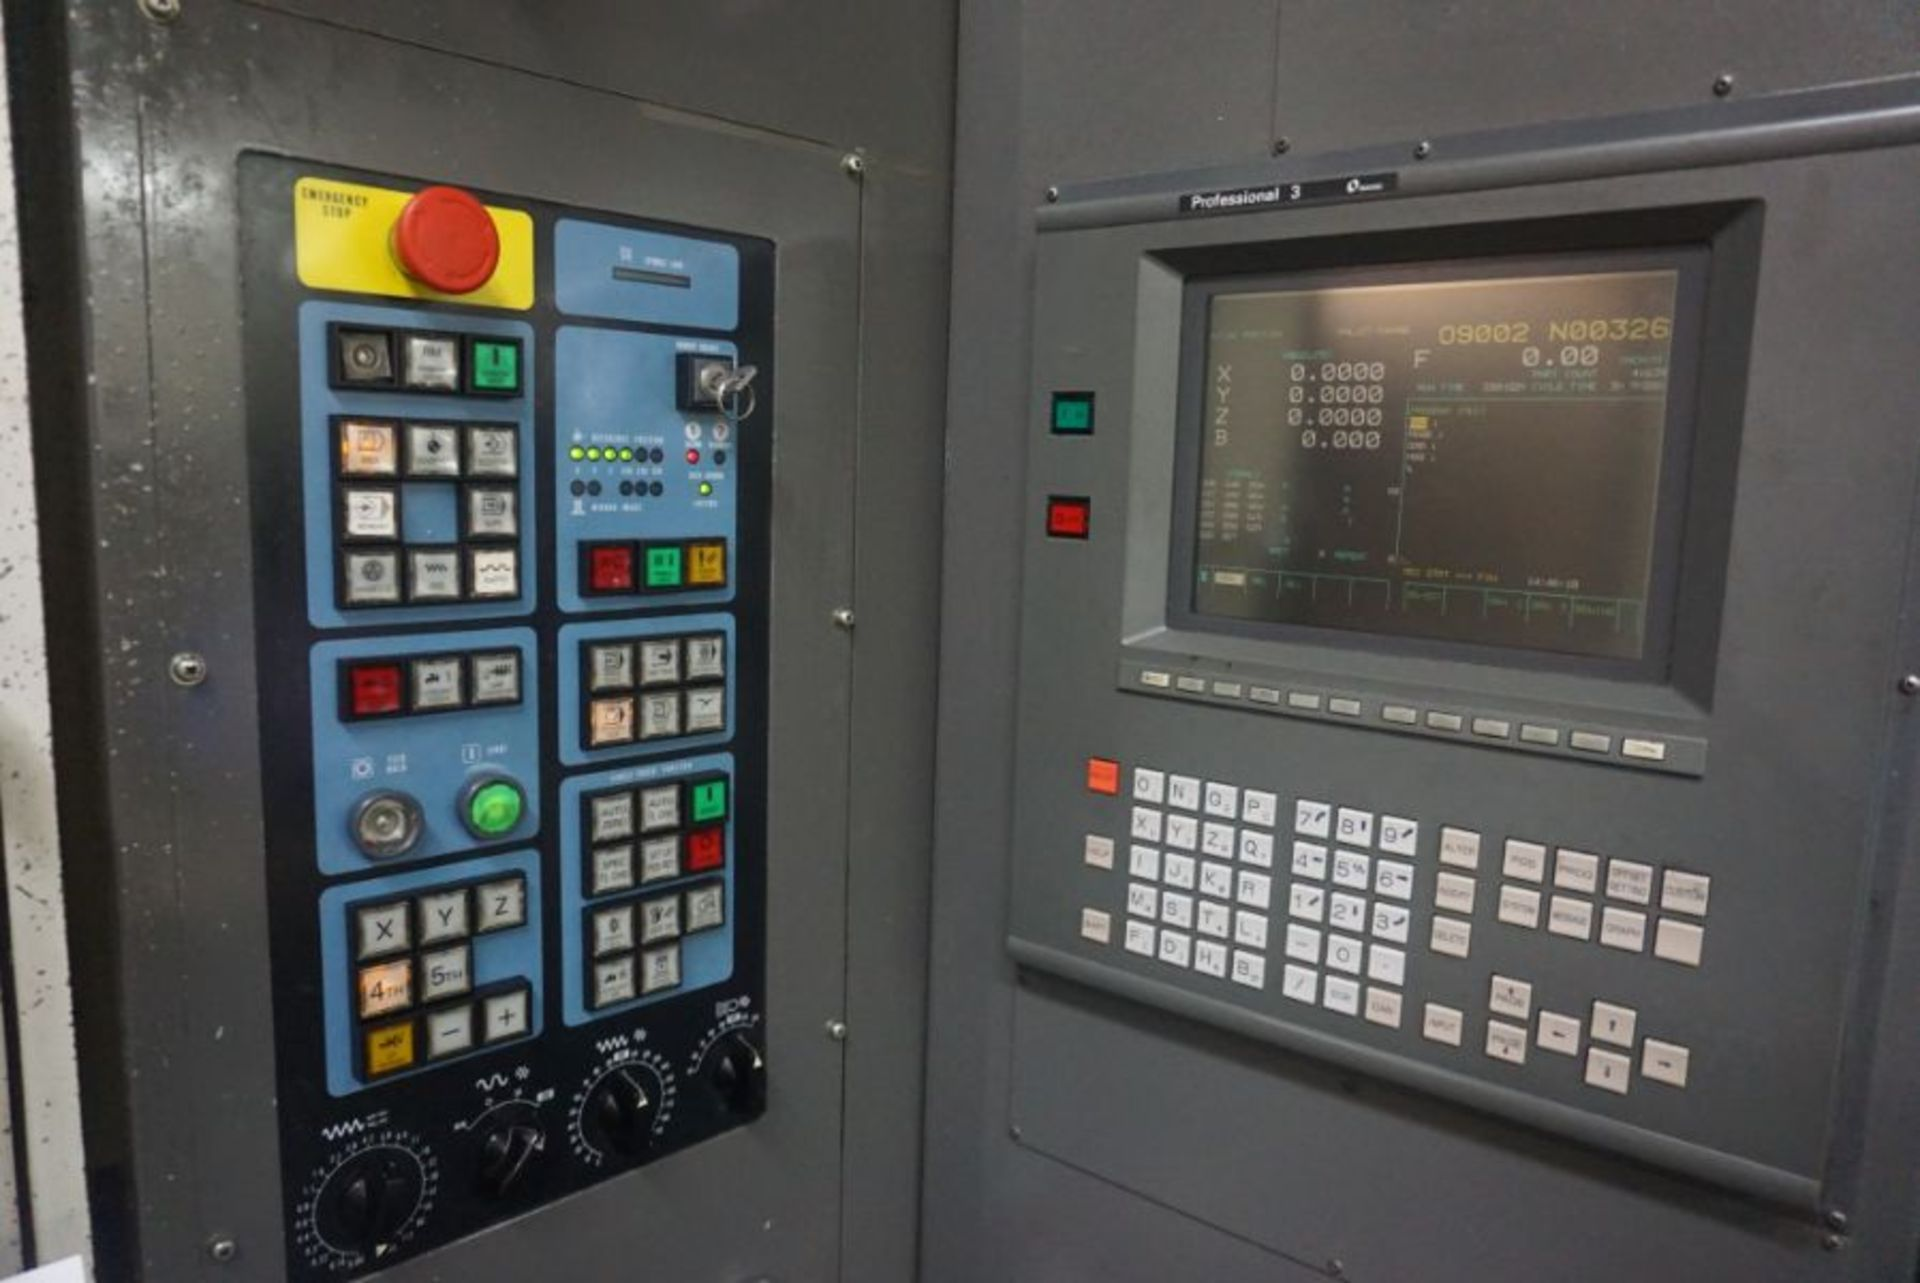 Makino MC98-A99 4-Axis Horizontal Machining Center, Fanuc 16 Pro 3 Control, New 1991 - Image 7 of 8